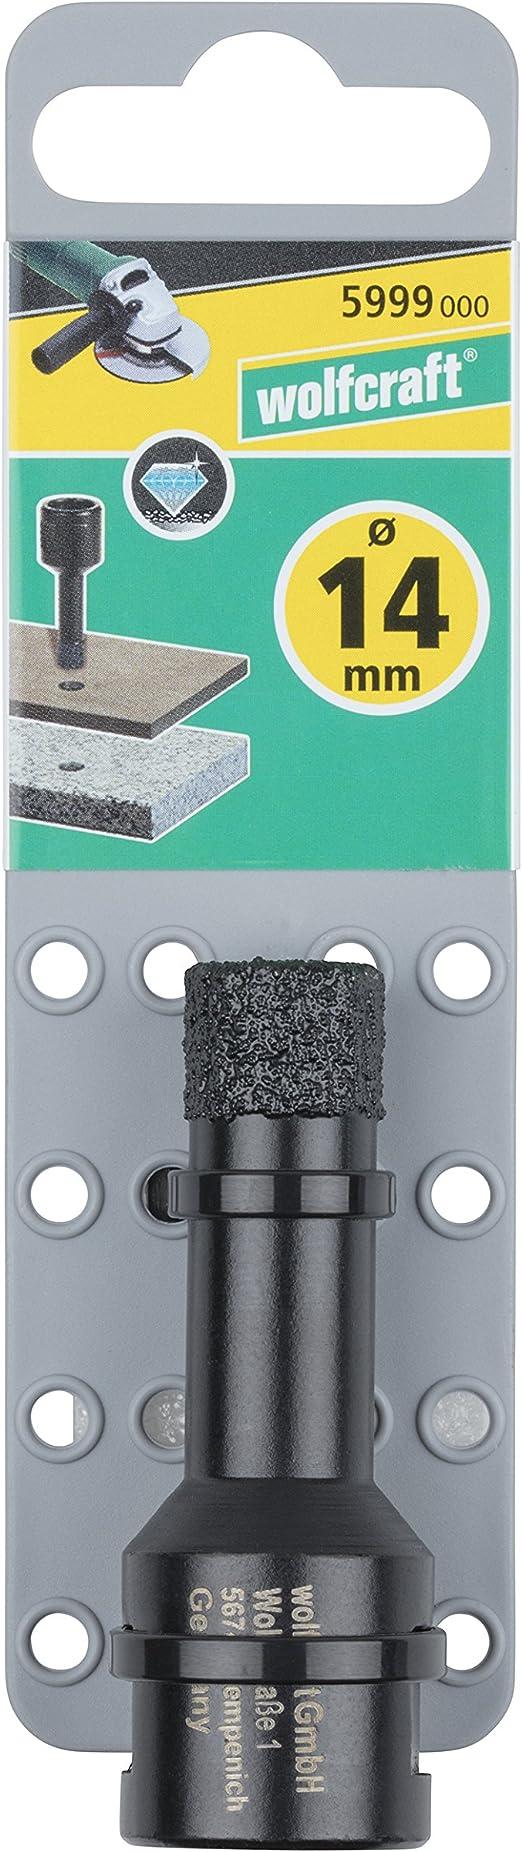 Wolfcraft 5999000 Diamant Foret Ceramic ø 14 Mm Filetage M 14 Profondeur De Coupe 35 Mm 1 V